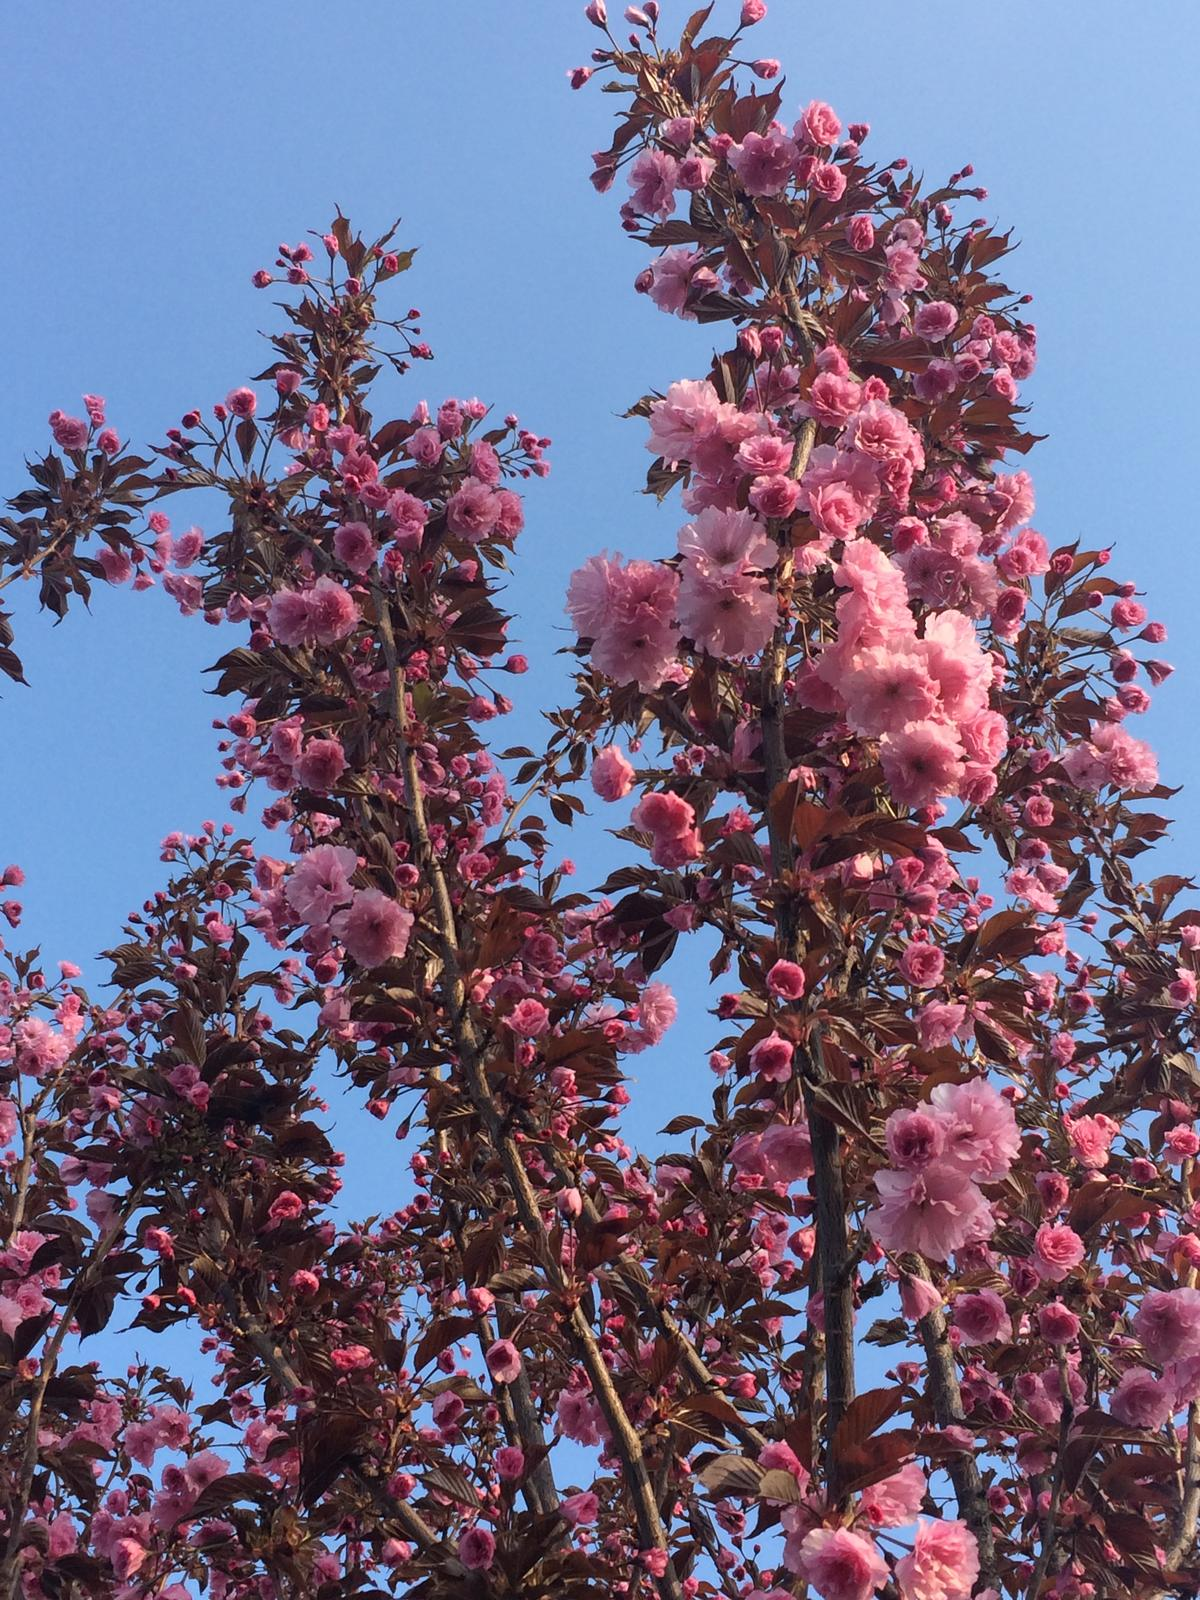 Zahrada 2018 - Letos je sakura obsypaná květy